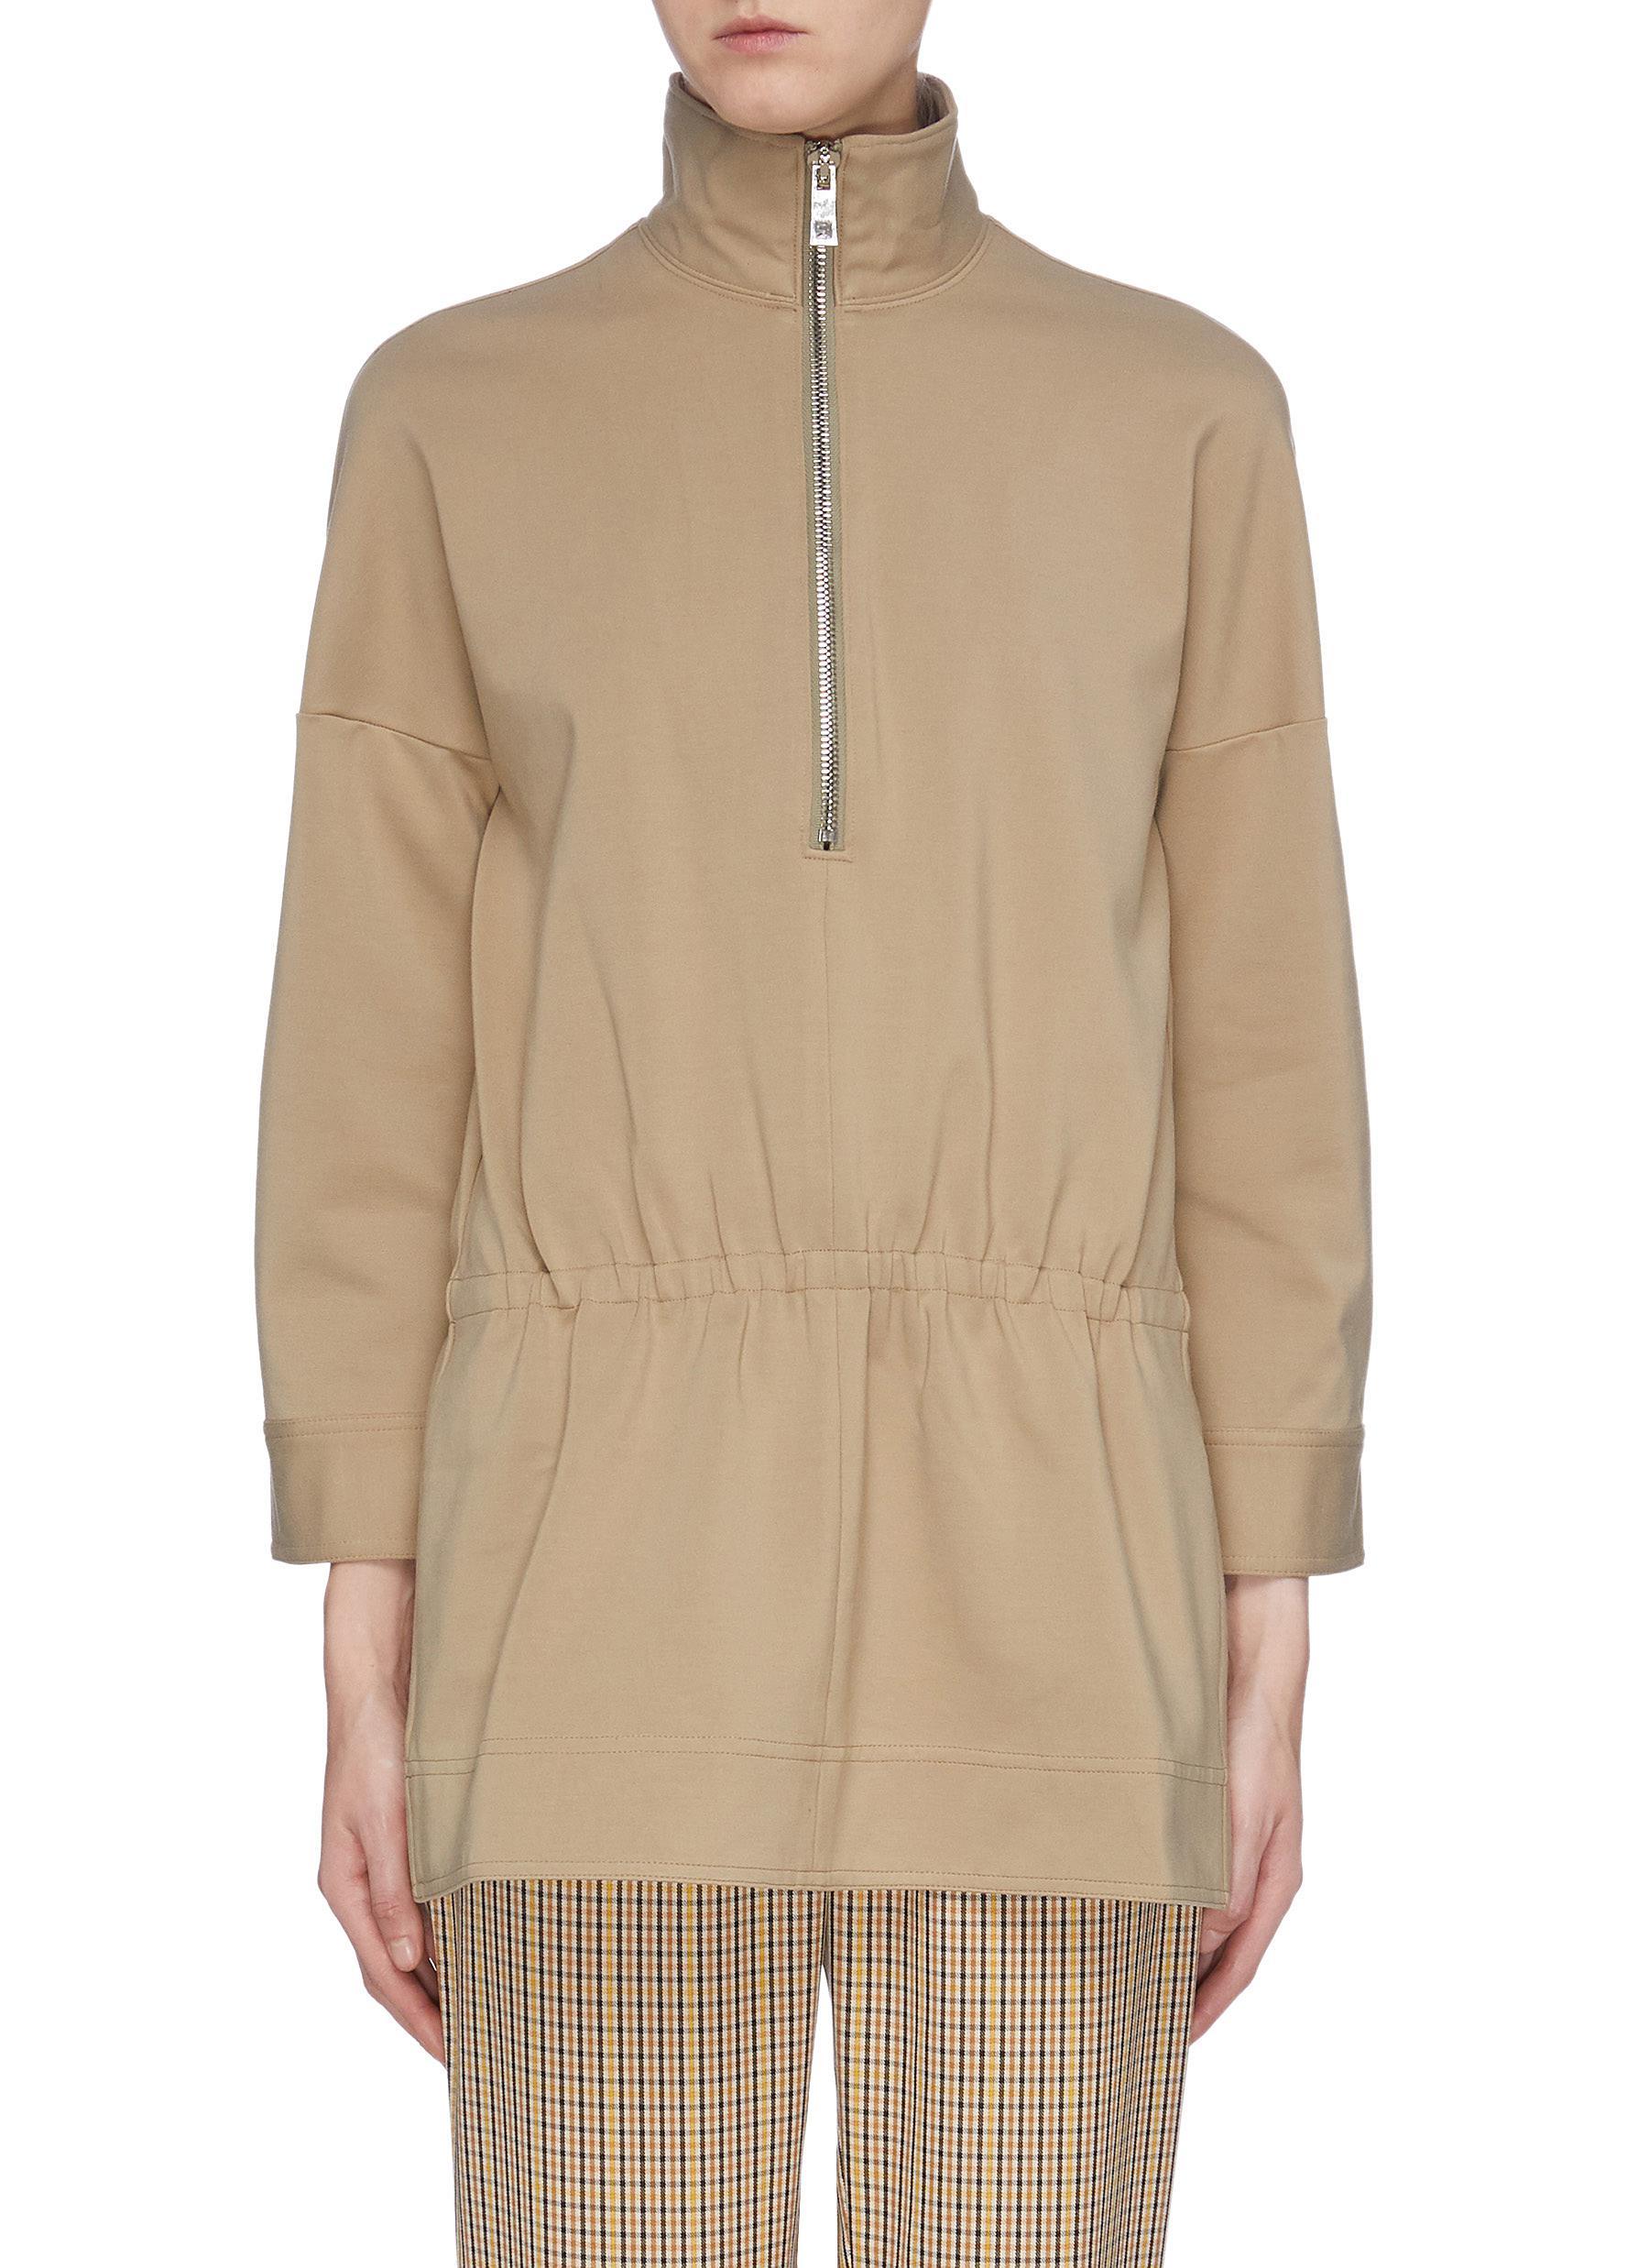 Bond elastic waist half zip tunic top by Tibi